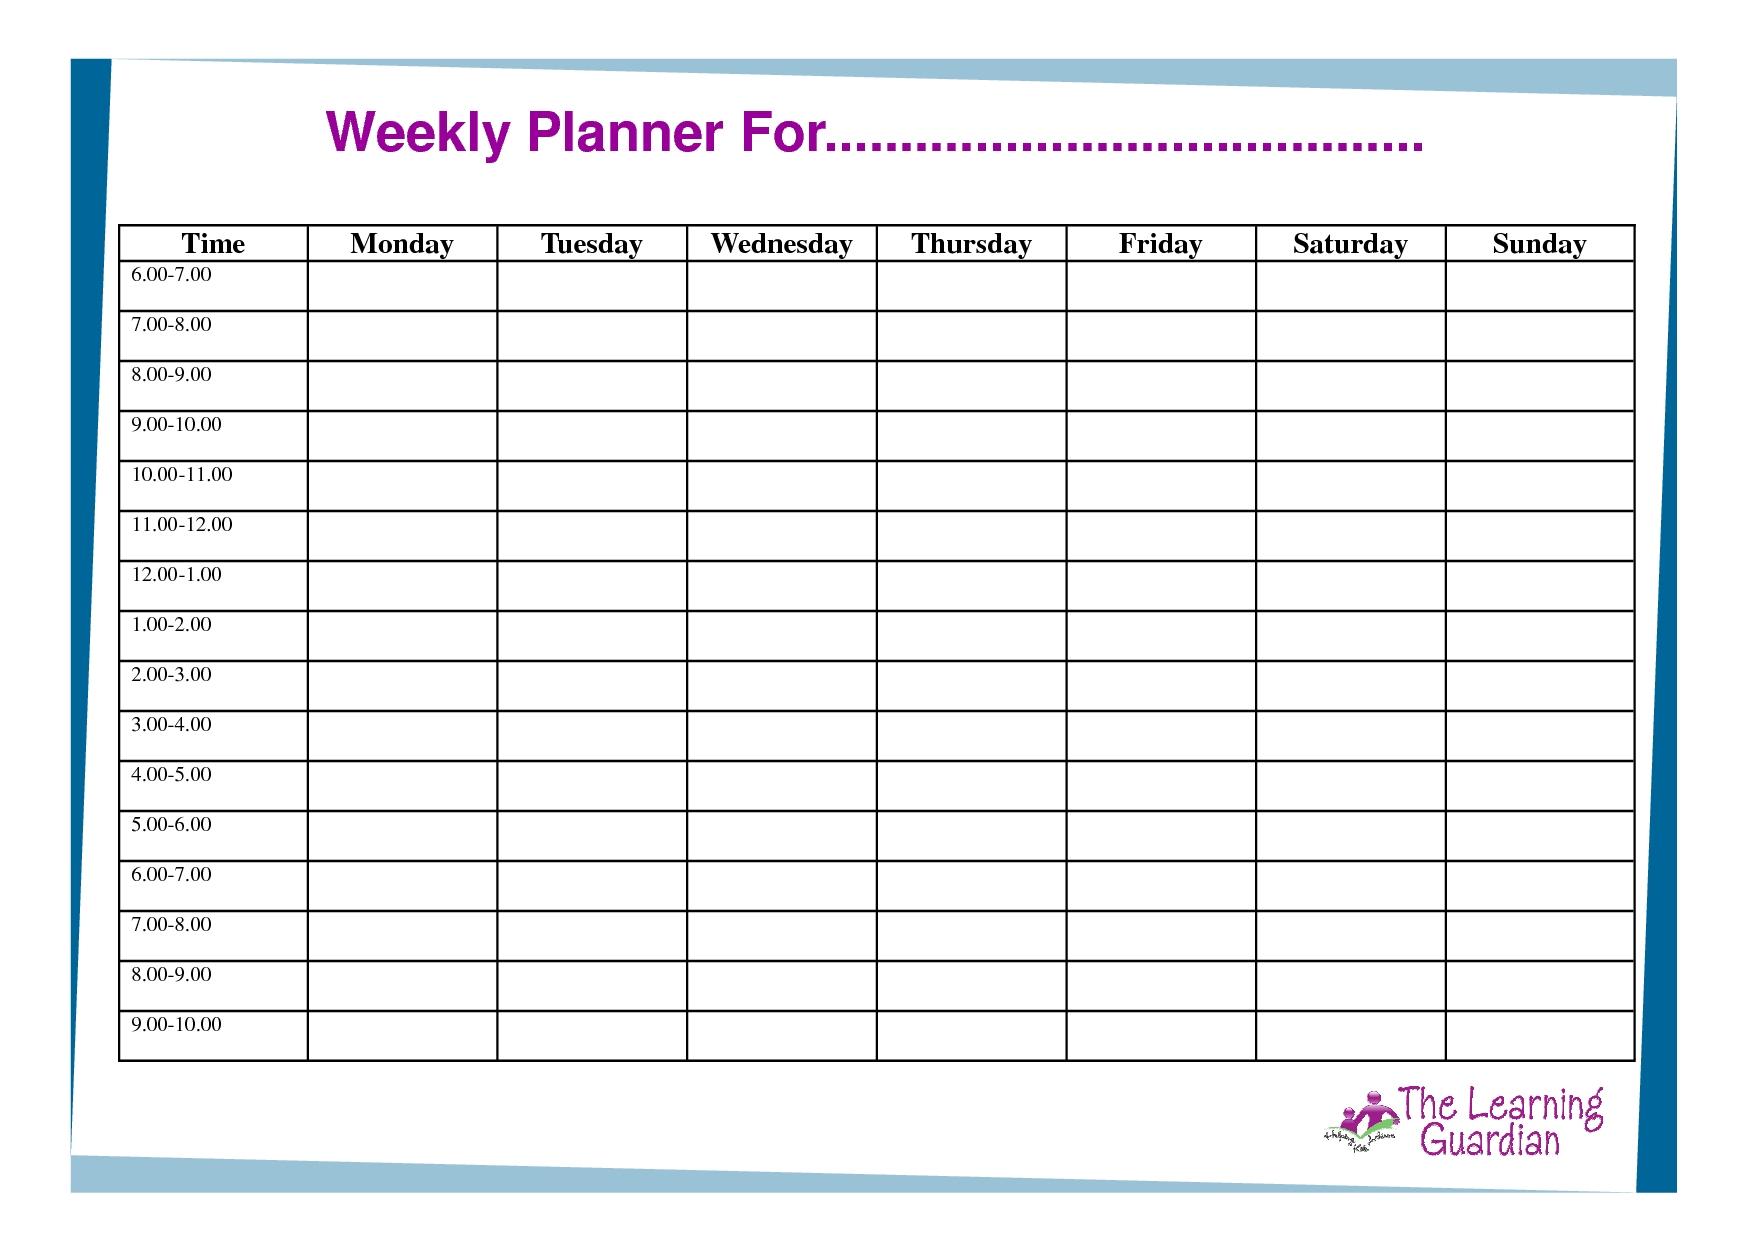 Monday Friday Blank Weekly Schedule   Calendar Template Monday To Friday Blank Week Schedule